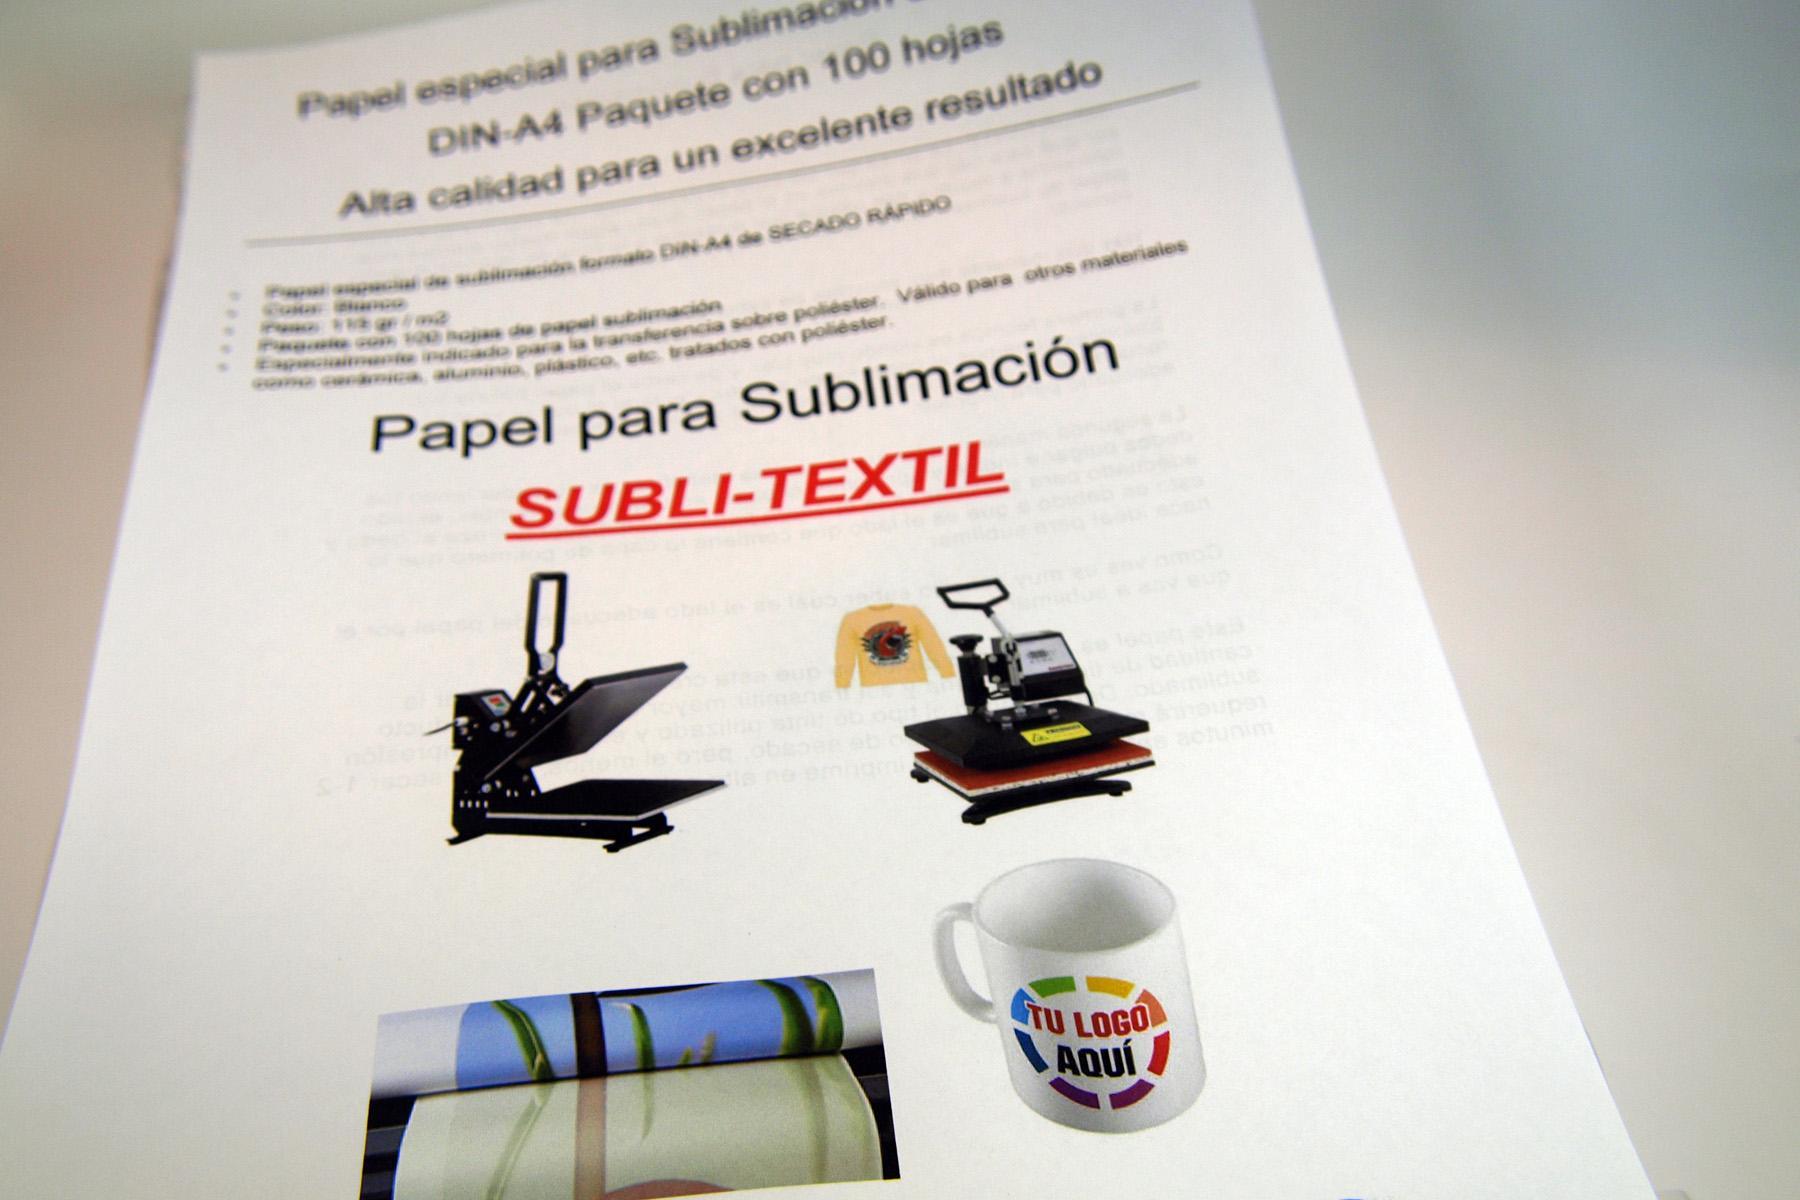 Papel Sublimación DIN-A4 115gr 100 hojas  SUBLI-TEXTIL